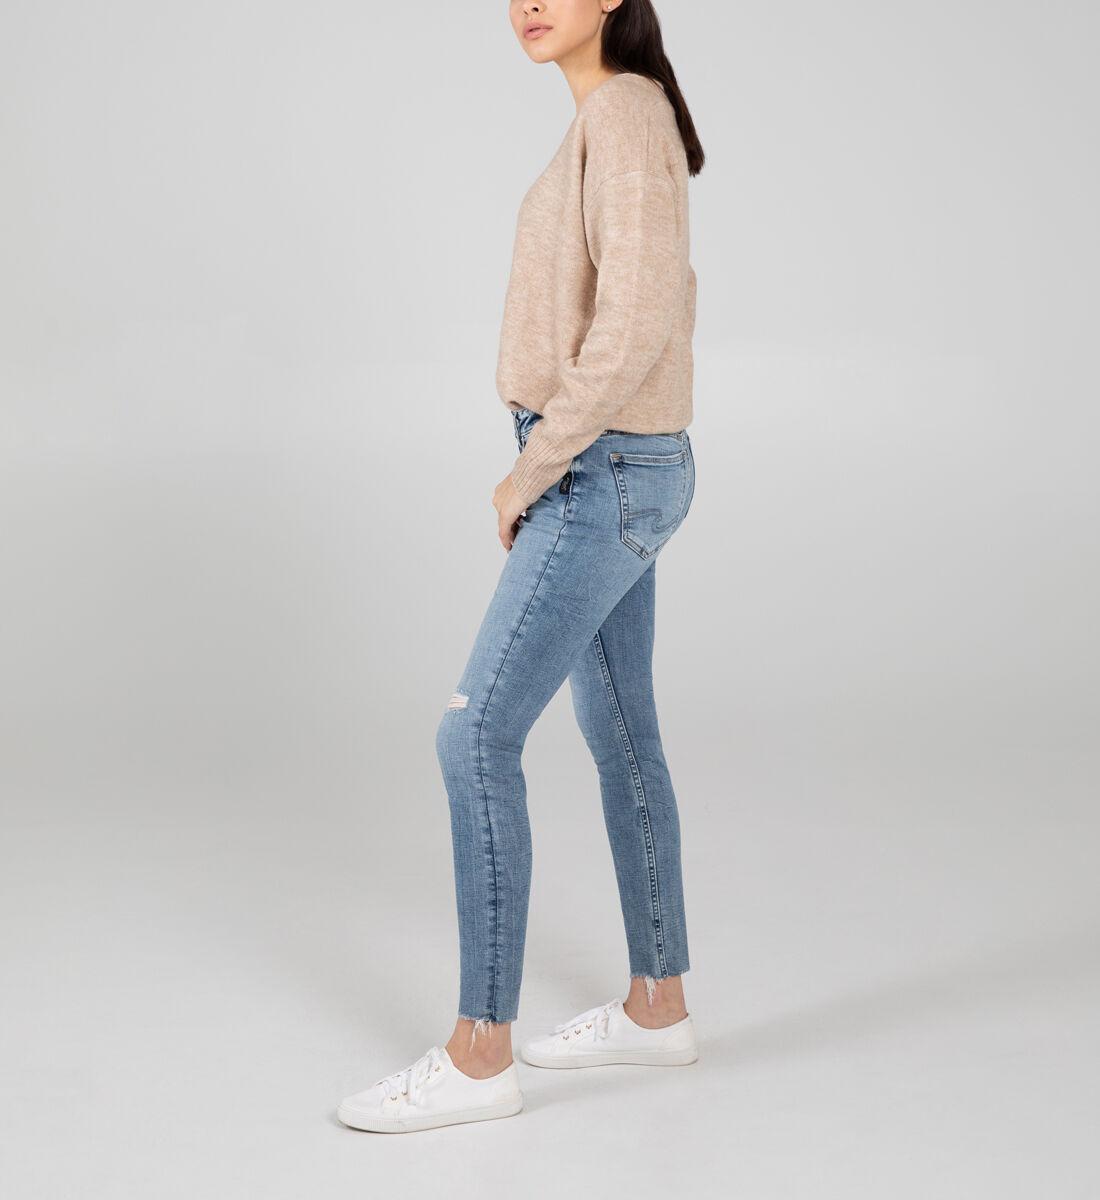 Suki Mid Rise Skinny Jeans Side